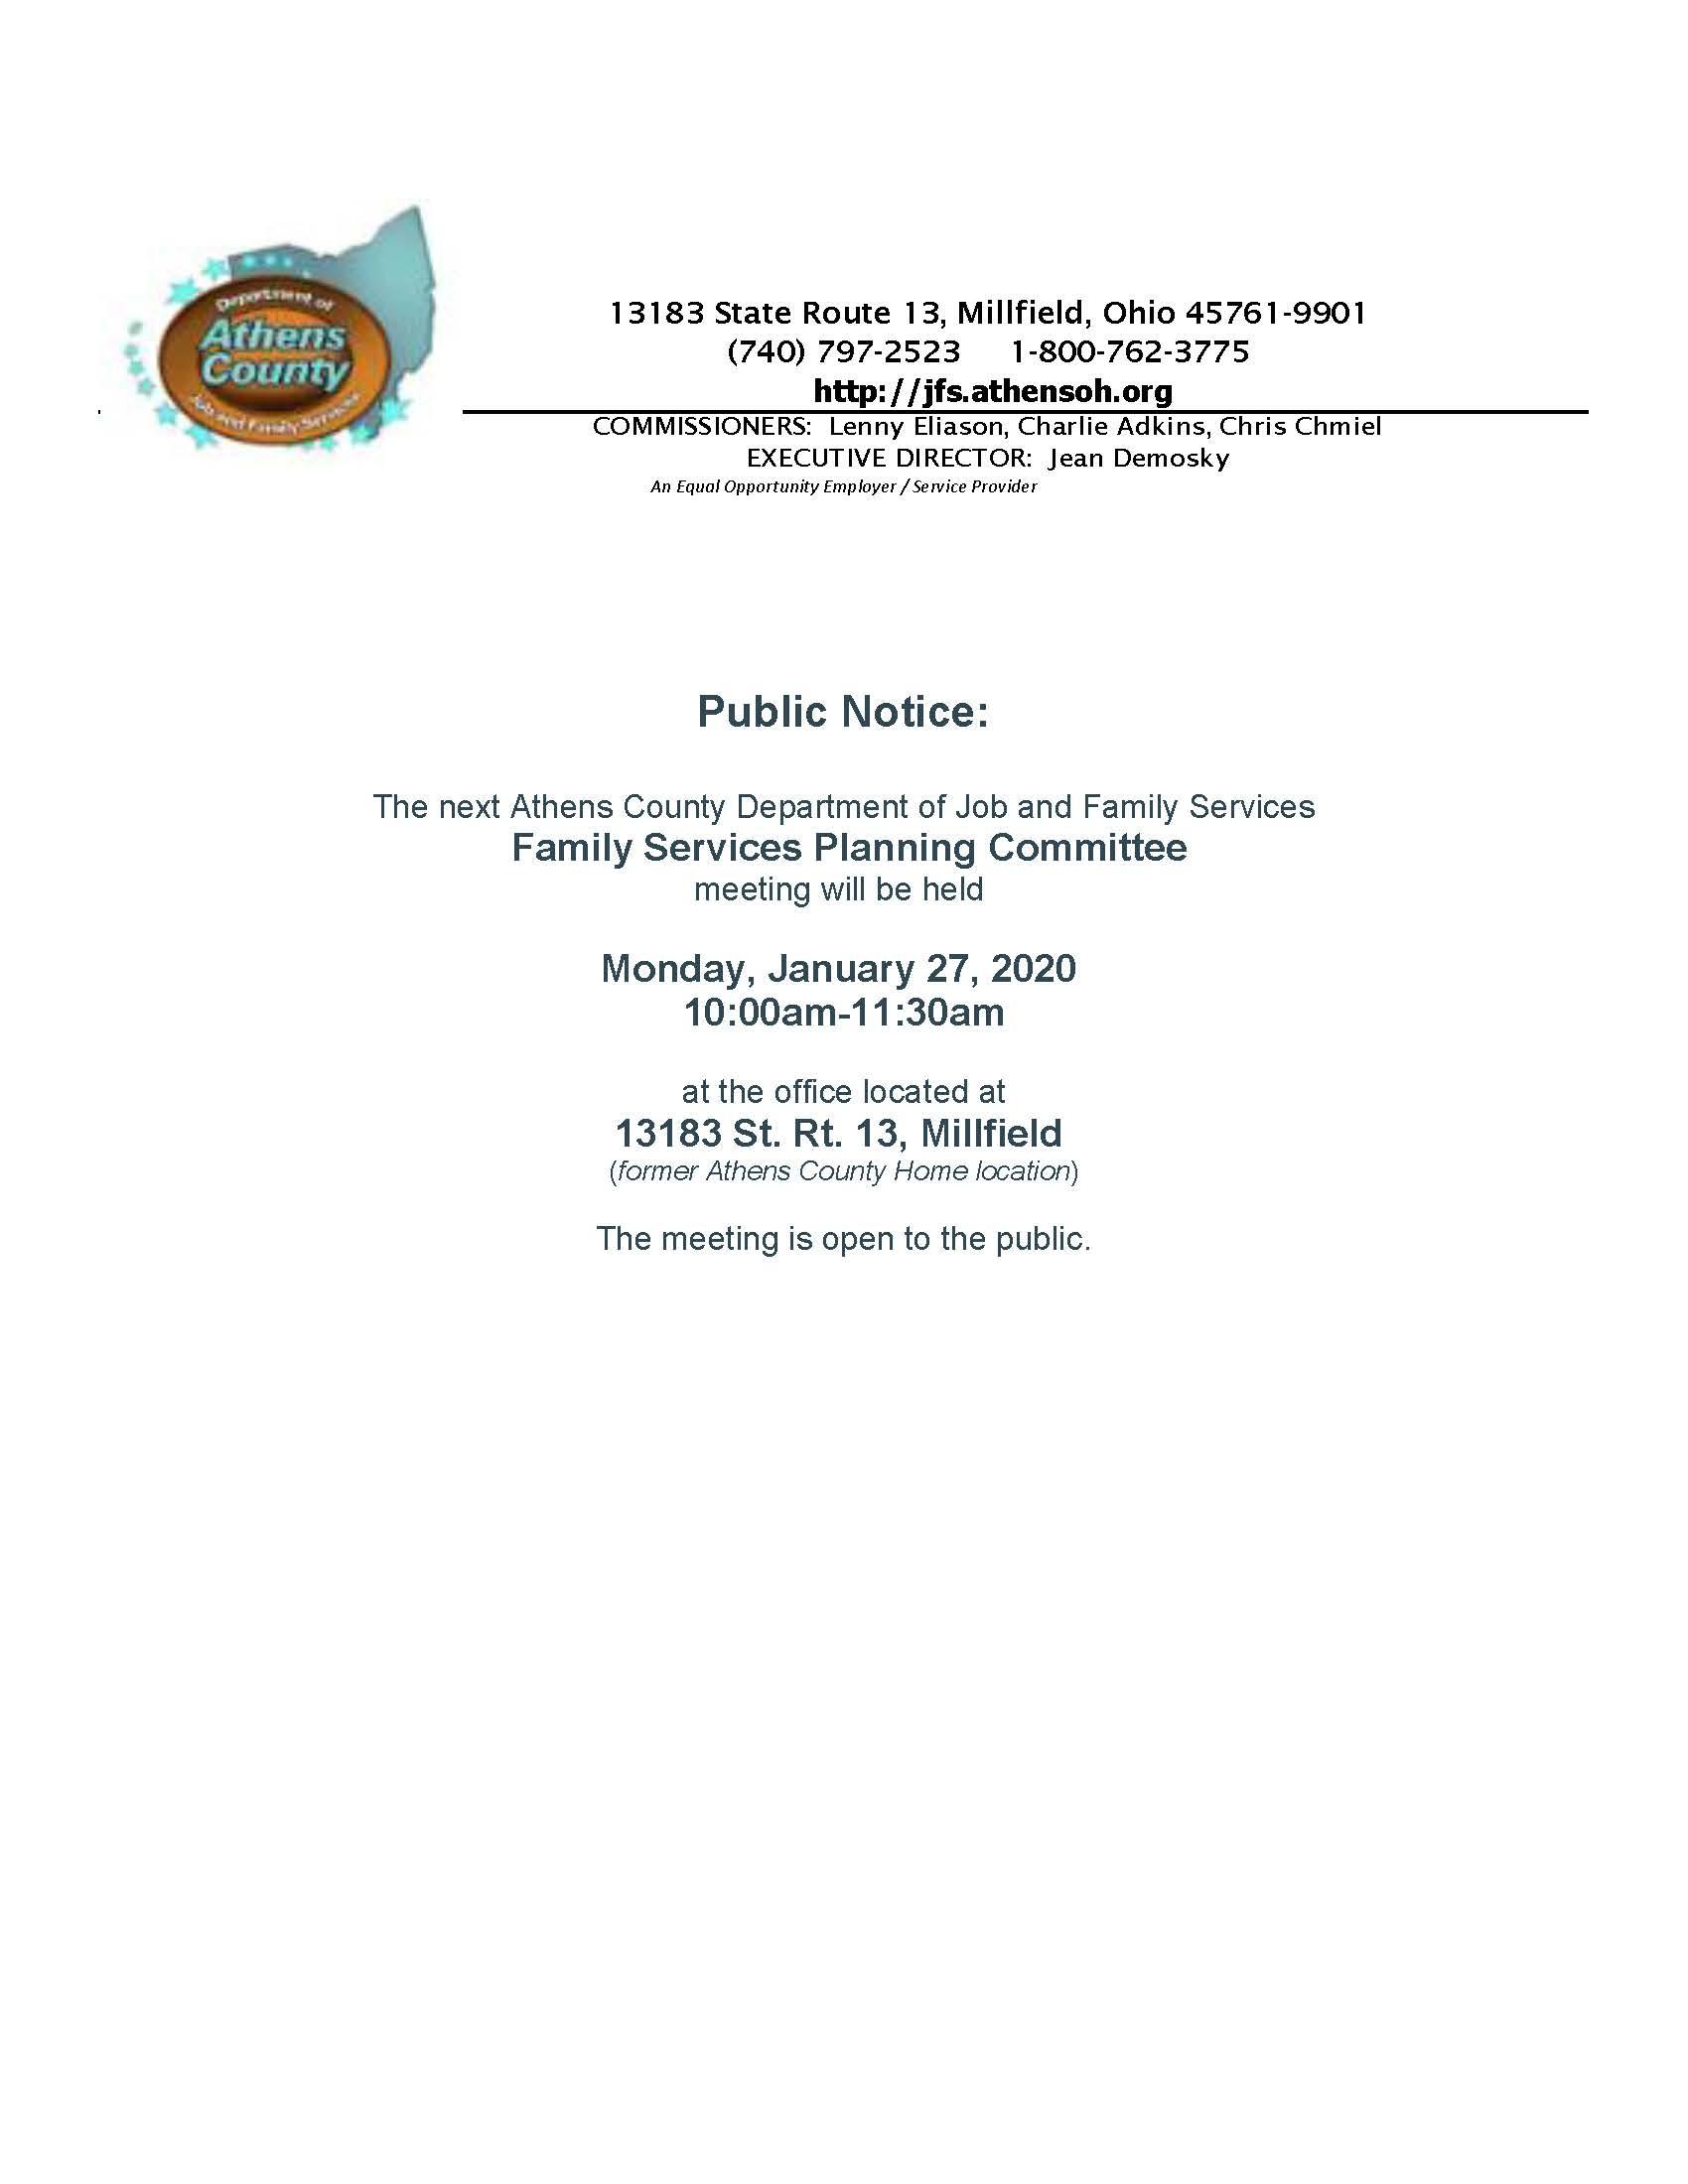 Family Panning Committee agenda